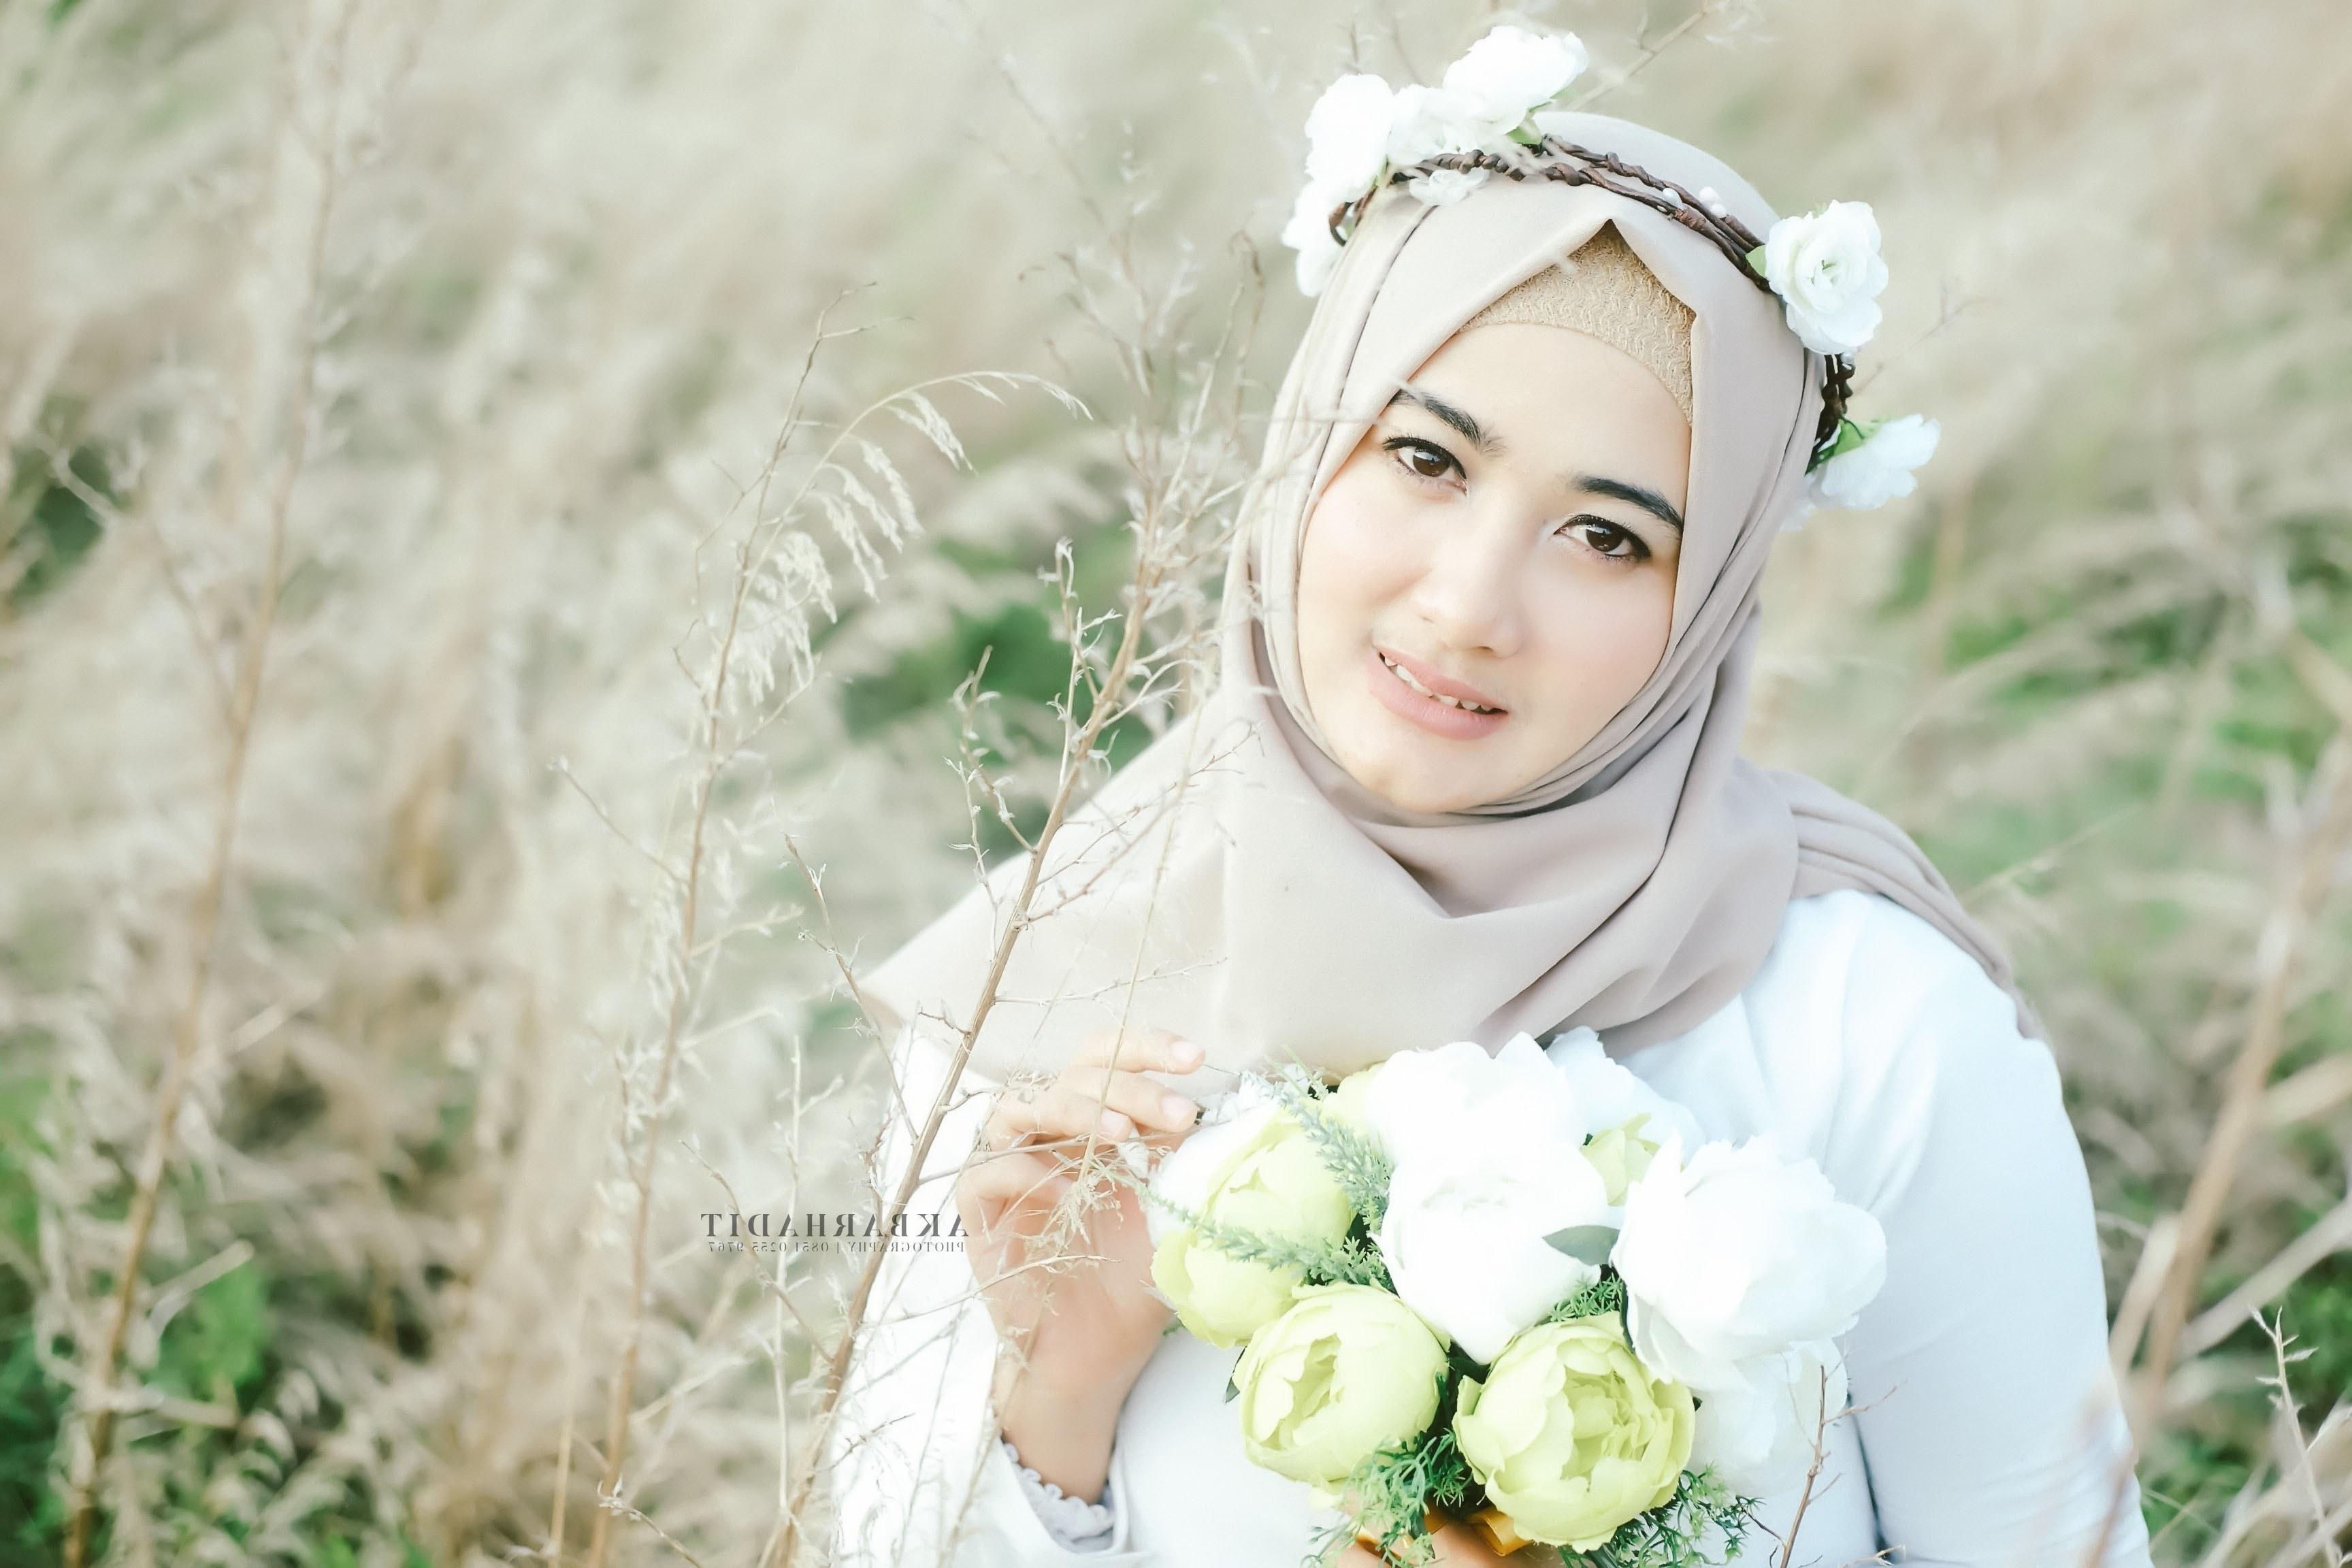 Inspirasi Gaun Pengantin Muslim Adat Jawa Wddj Contoh Pose Foto Pengantin Di Pelaminan Inspiratif Wiguna